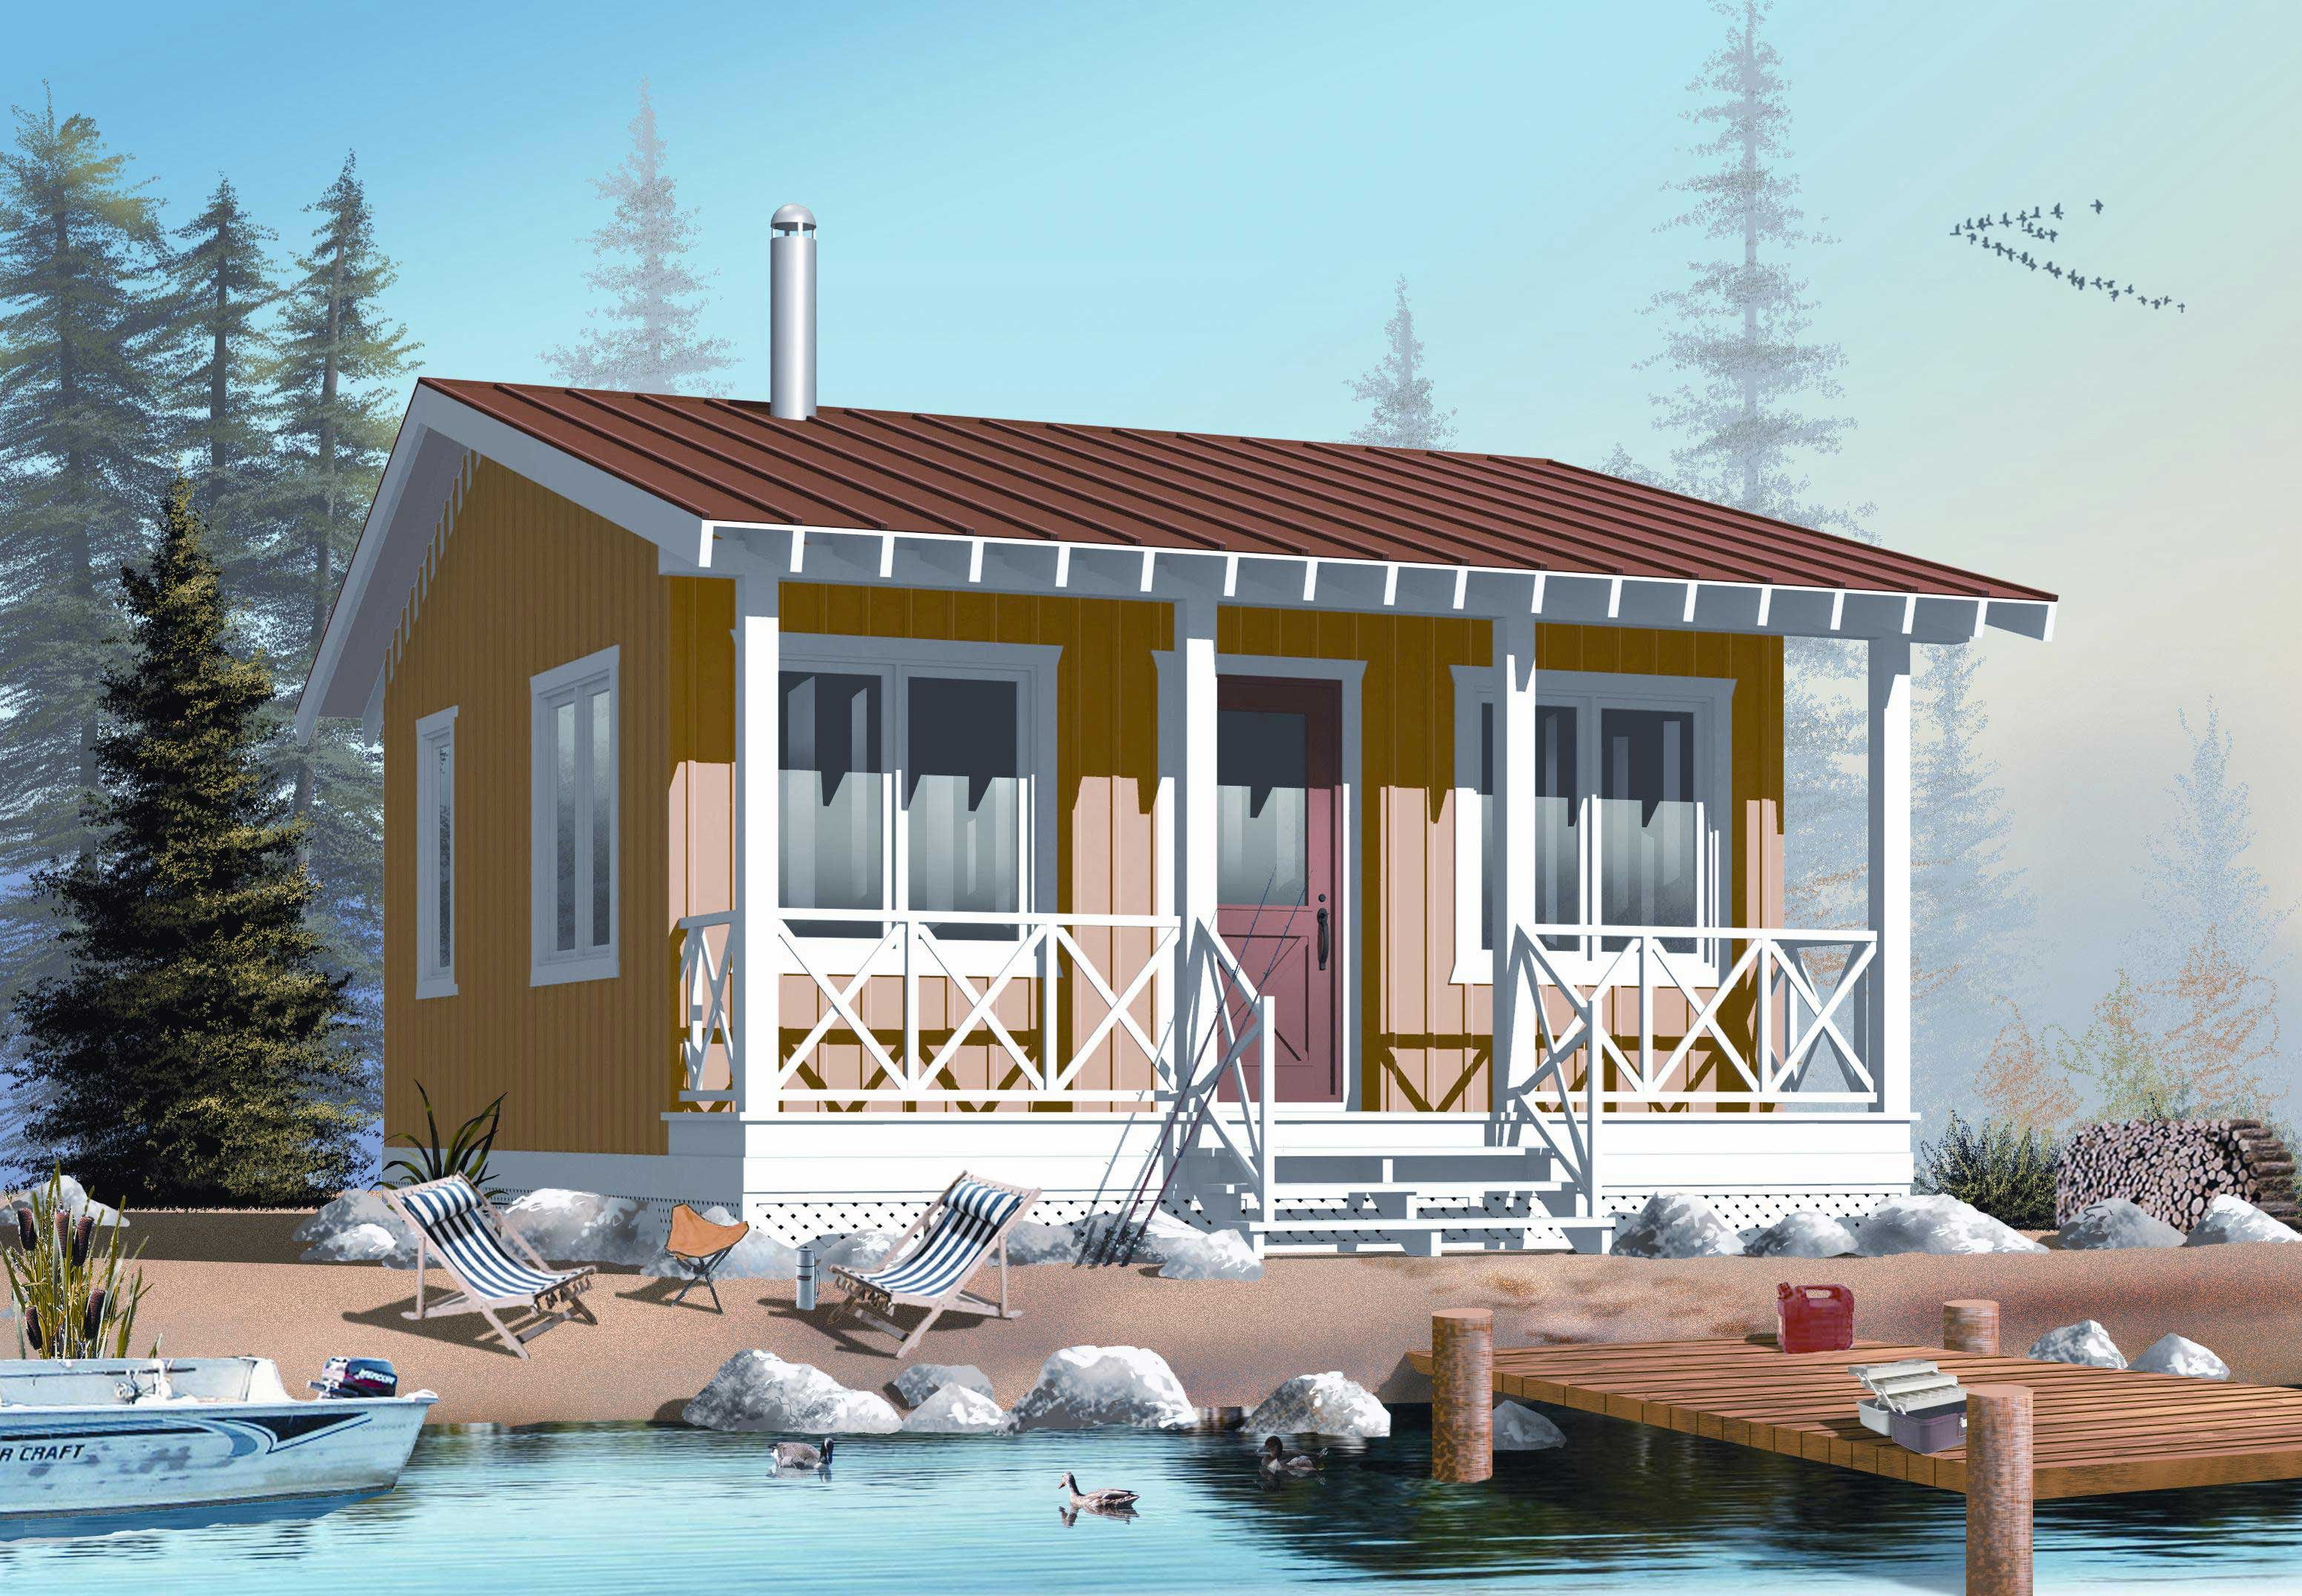 Small House Plan / Tiny Home 1 Bedrm, 1 Bath 400 Sq Ft 1261022 - Small Modern Cheap House Plans — MODERN HOUSE PLAN : MODERN HOUSE PLAN